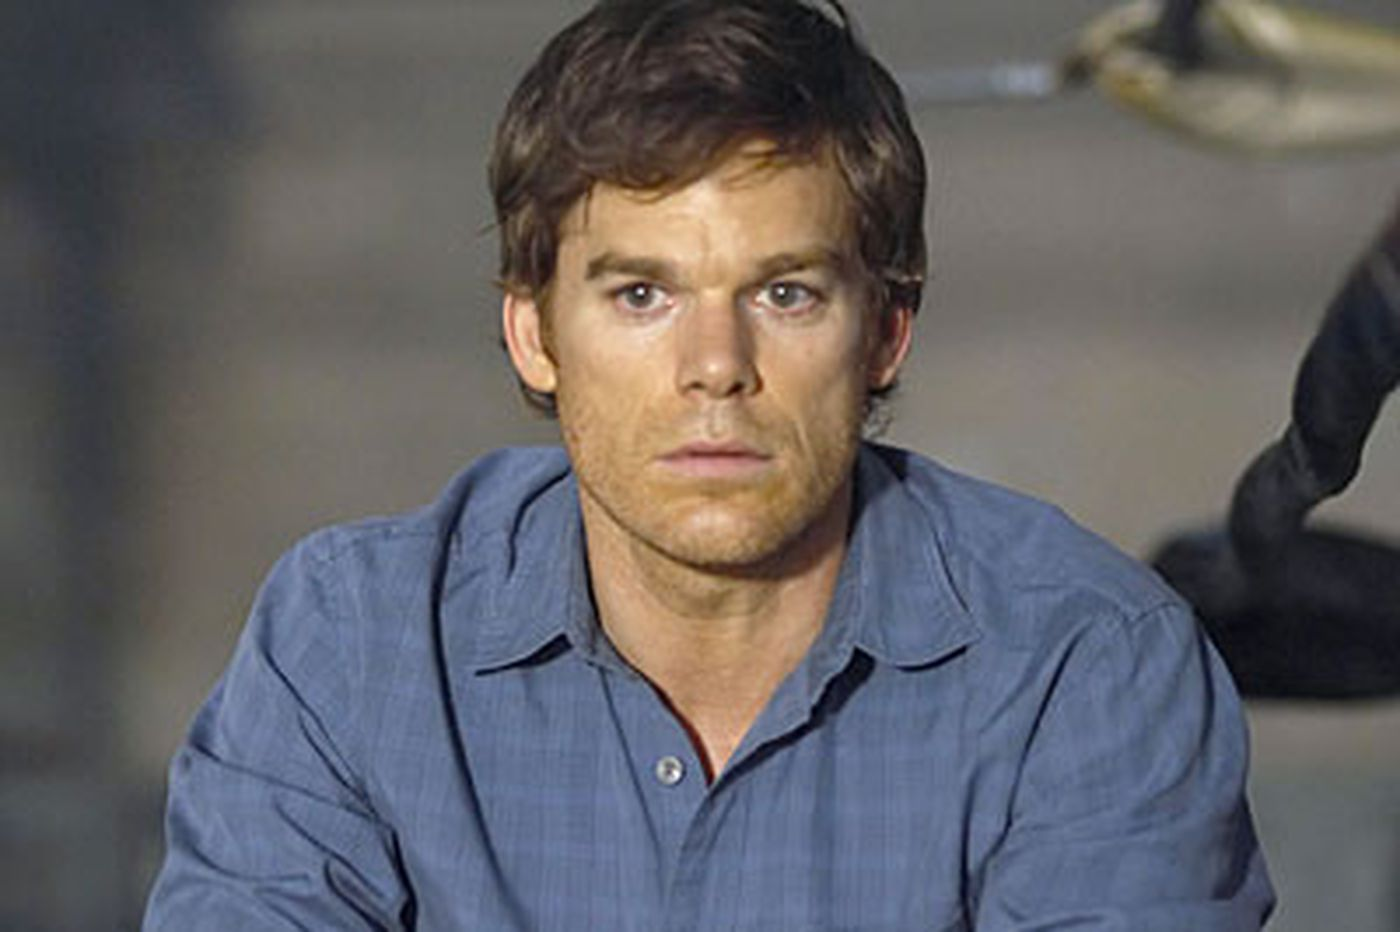 Jonathan Storm: Dexter's a dad and a sleepless serial killer